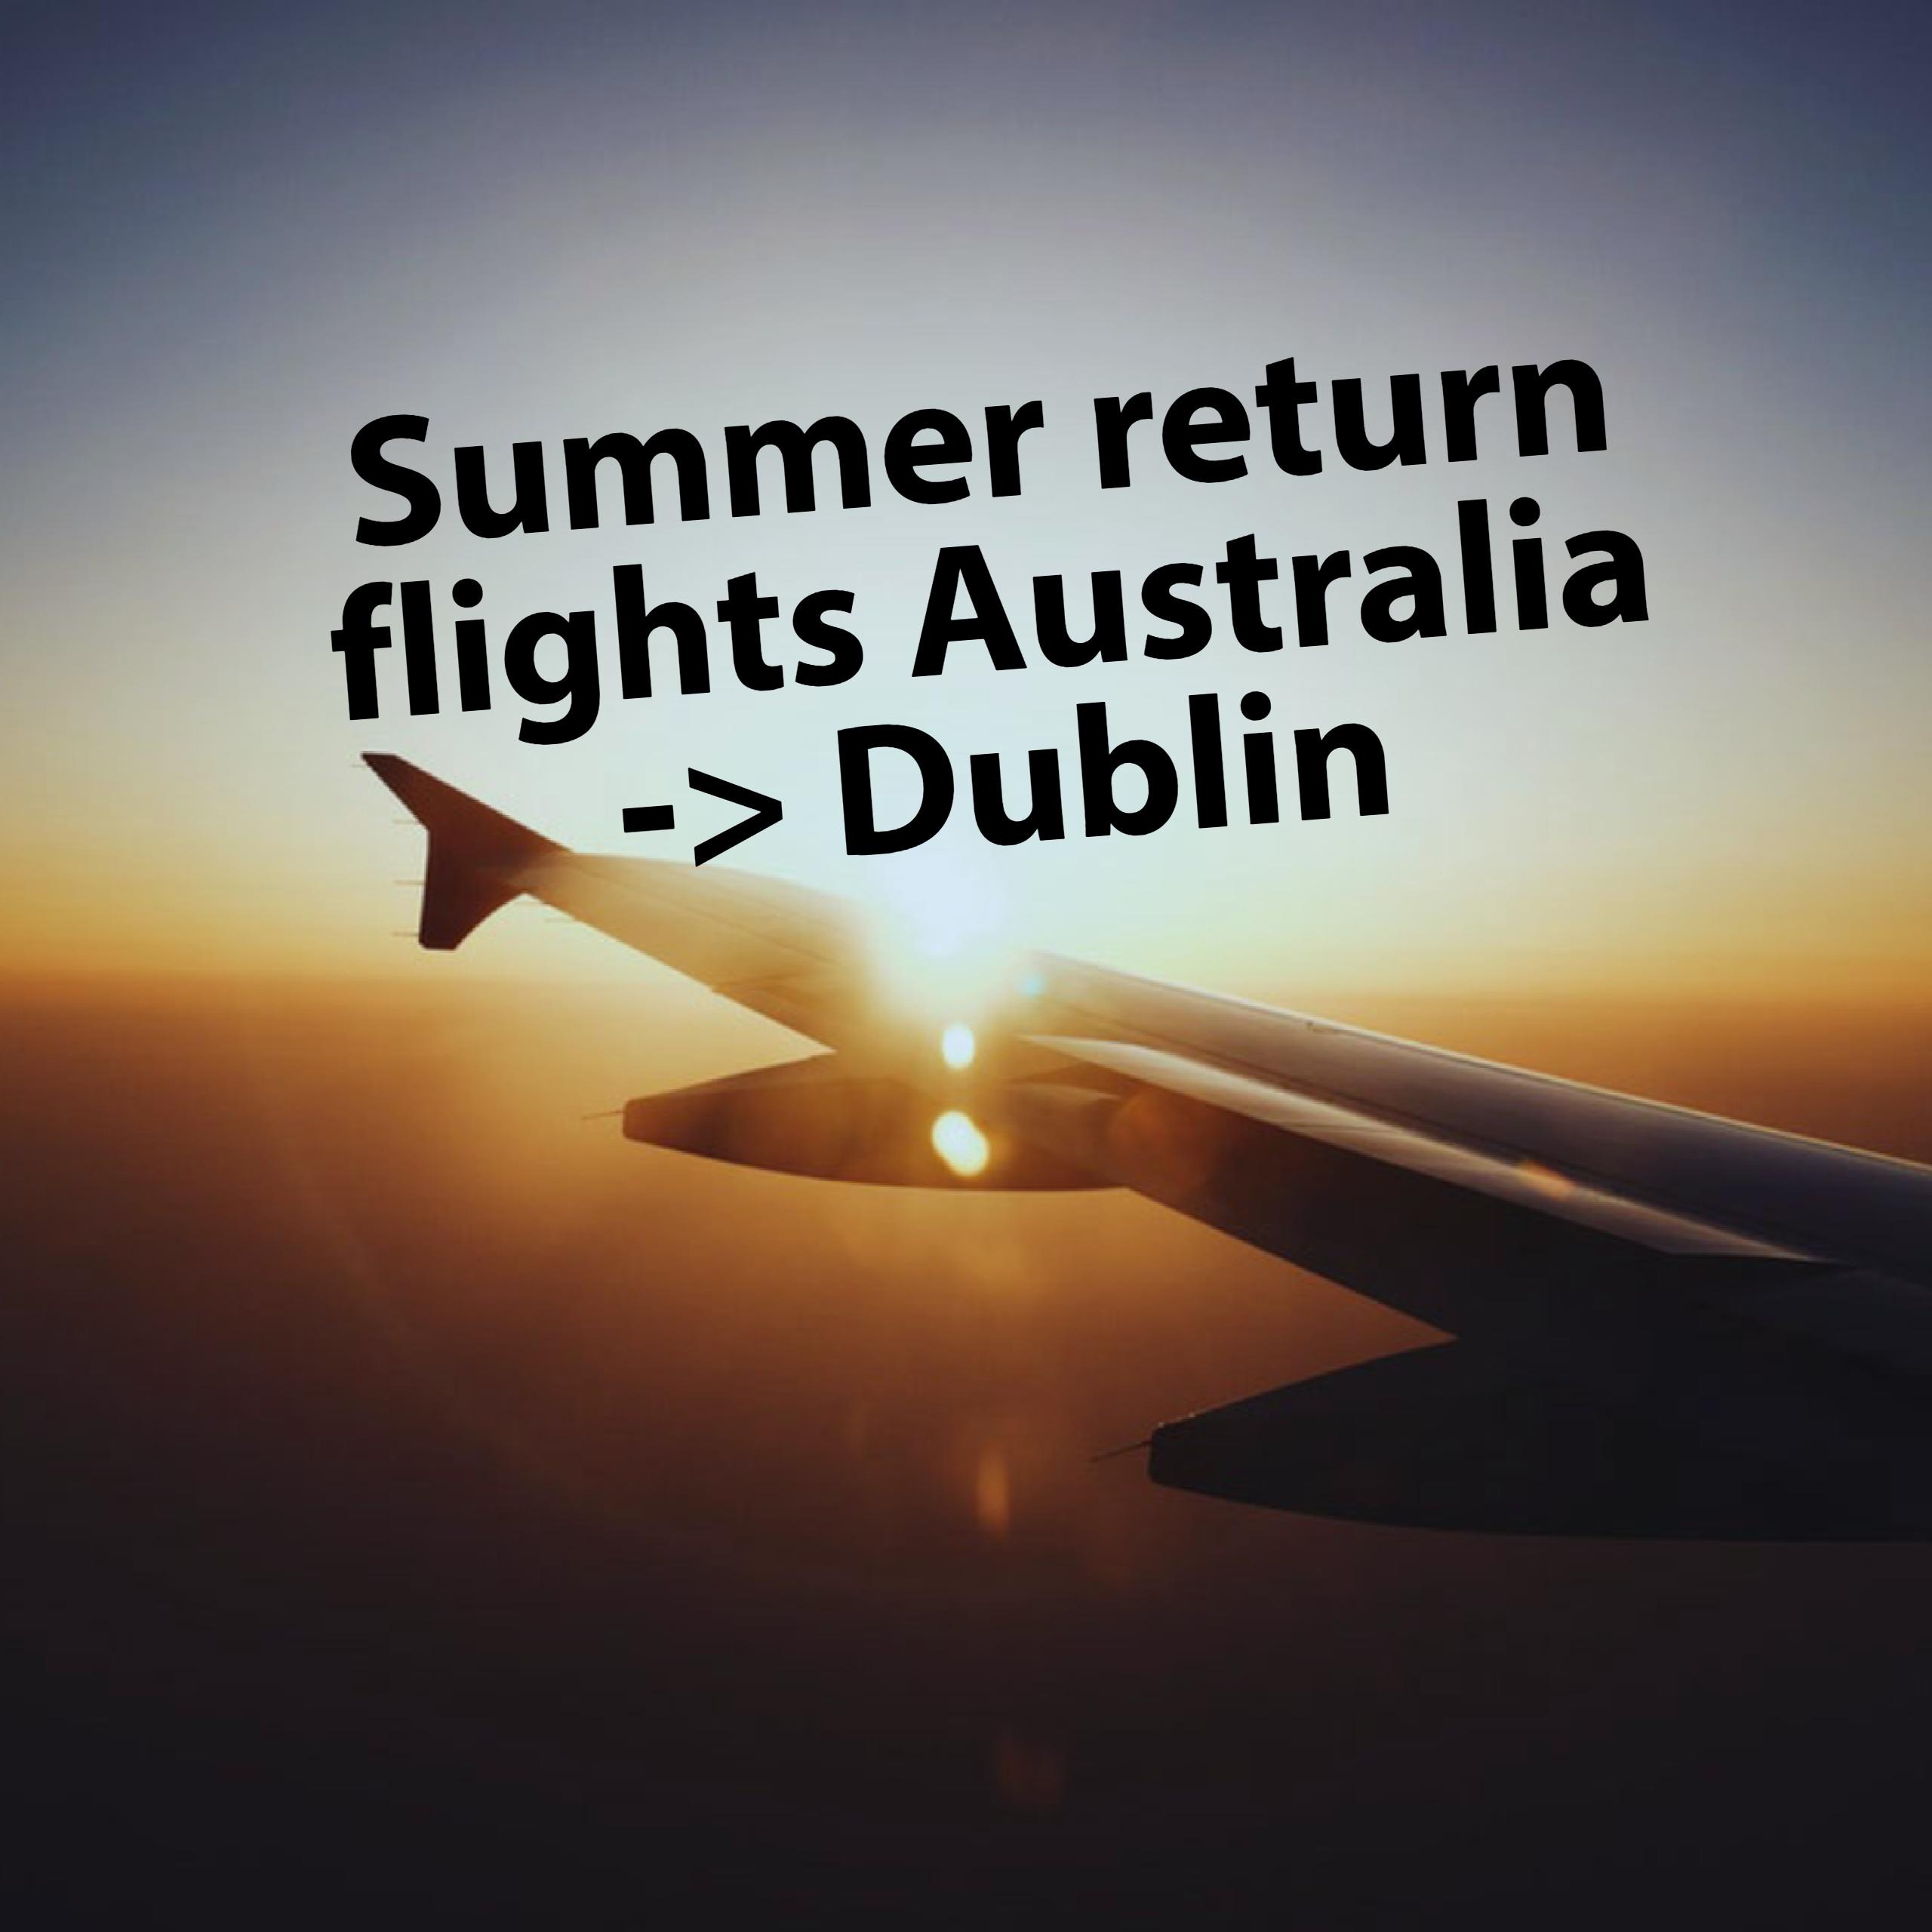 Summmer return flights Australia to Ireland 2018